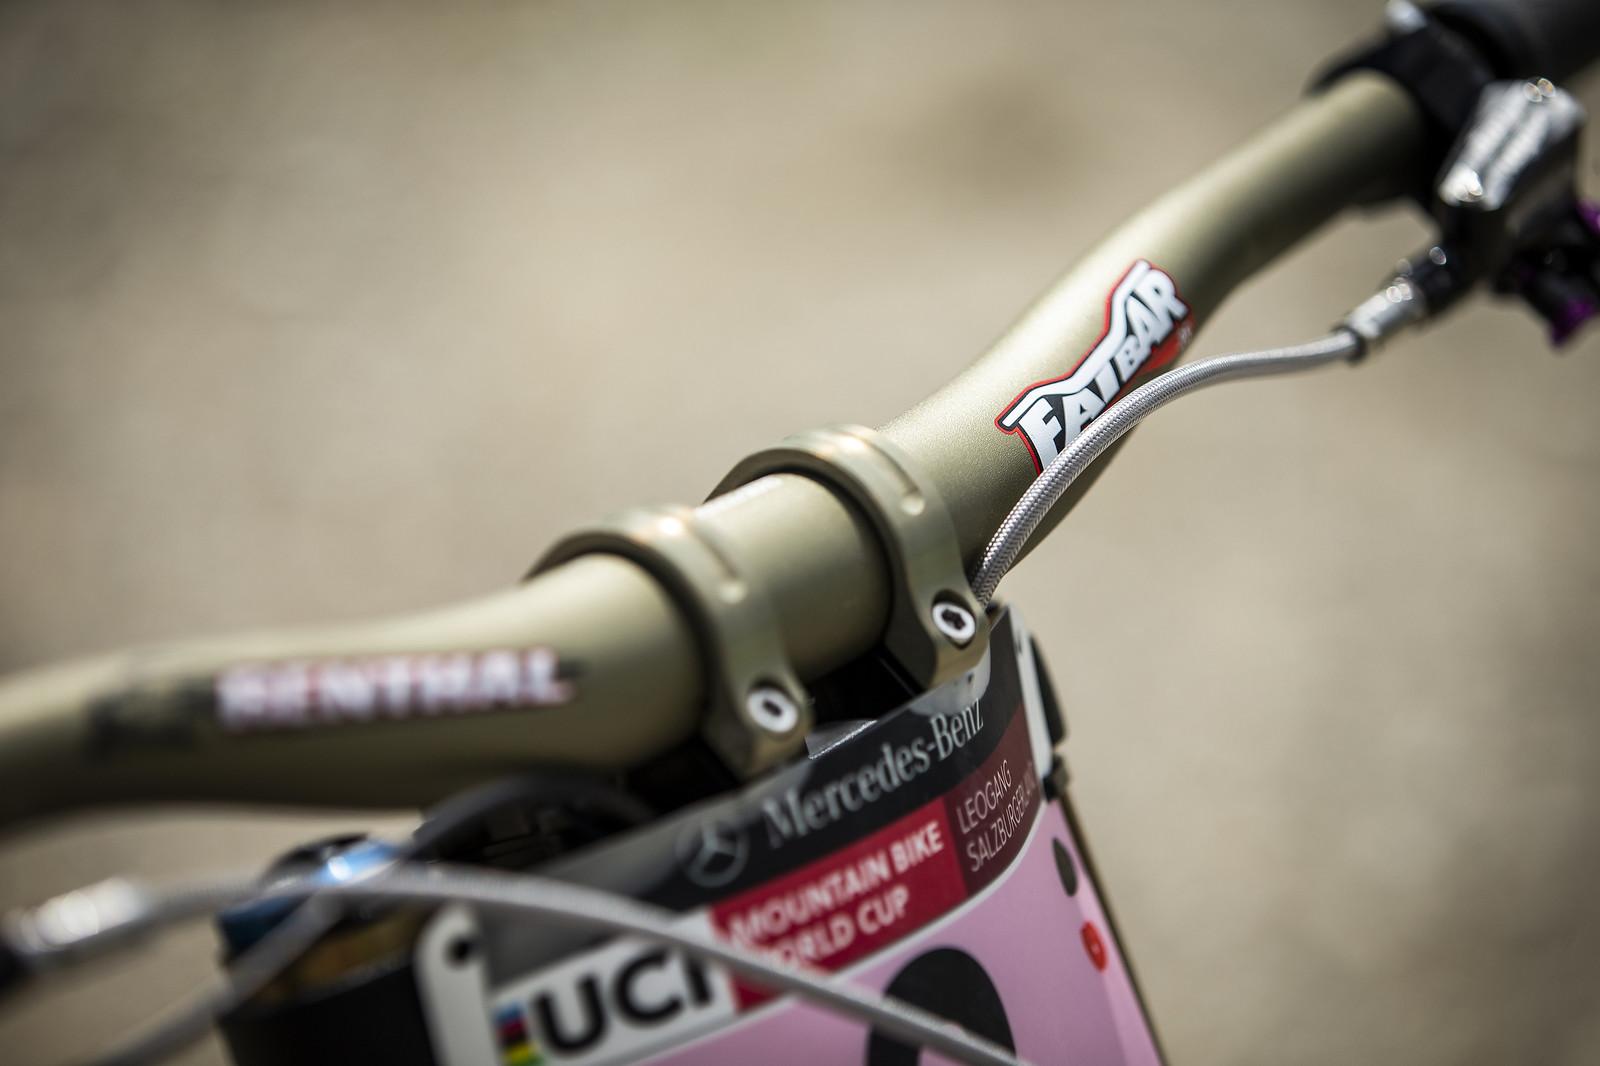 Renthal Bars and Stem - WINNING BIKE - Rachel Atherton's Trek Session - Mountain Biking Pictures - Vital MTB